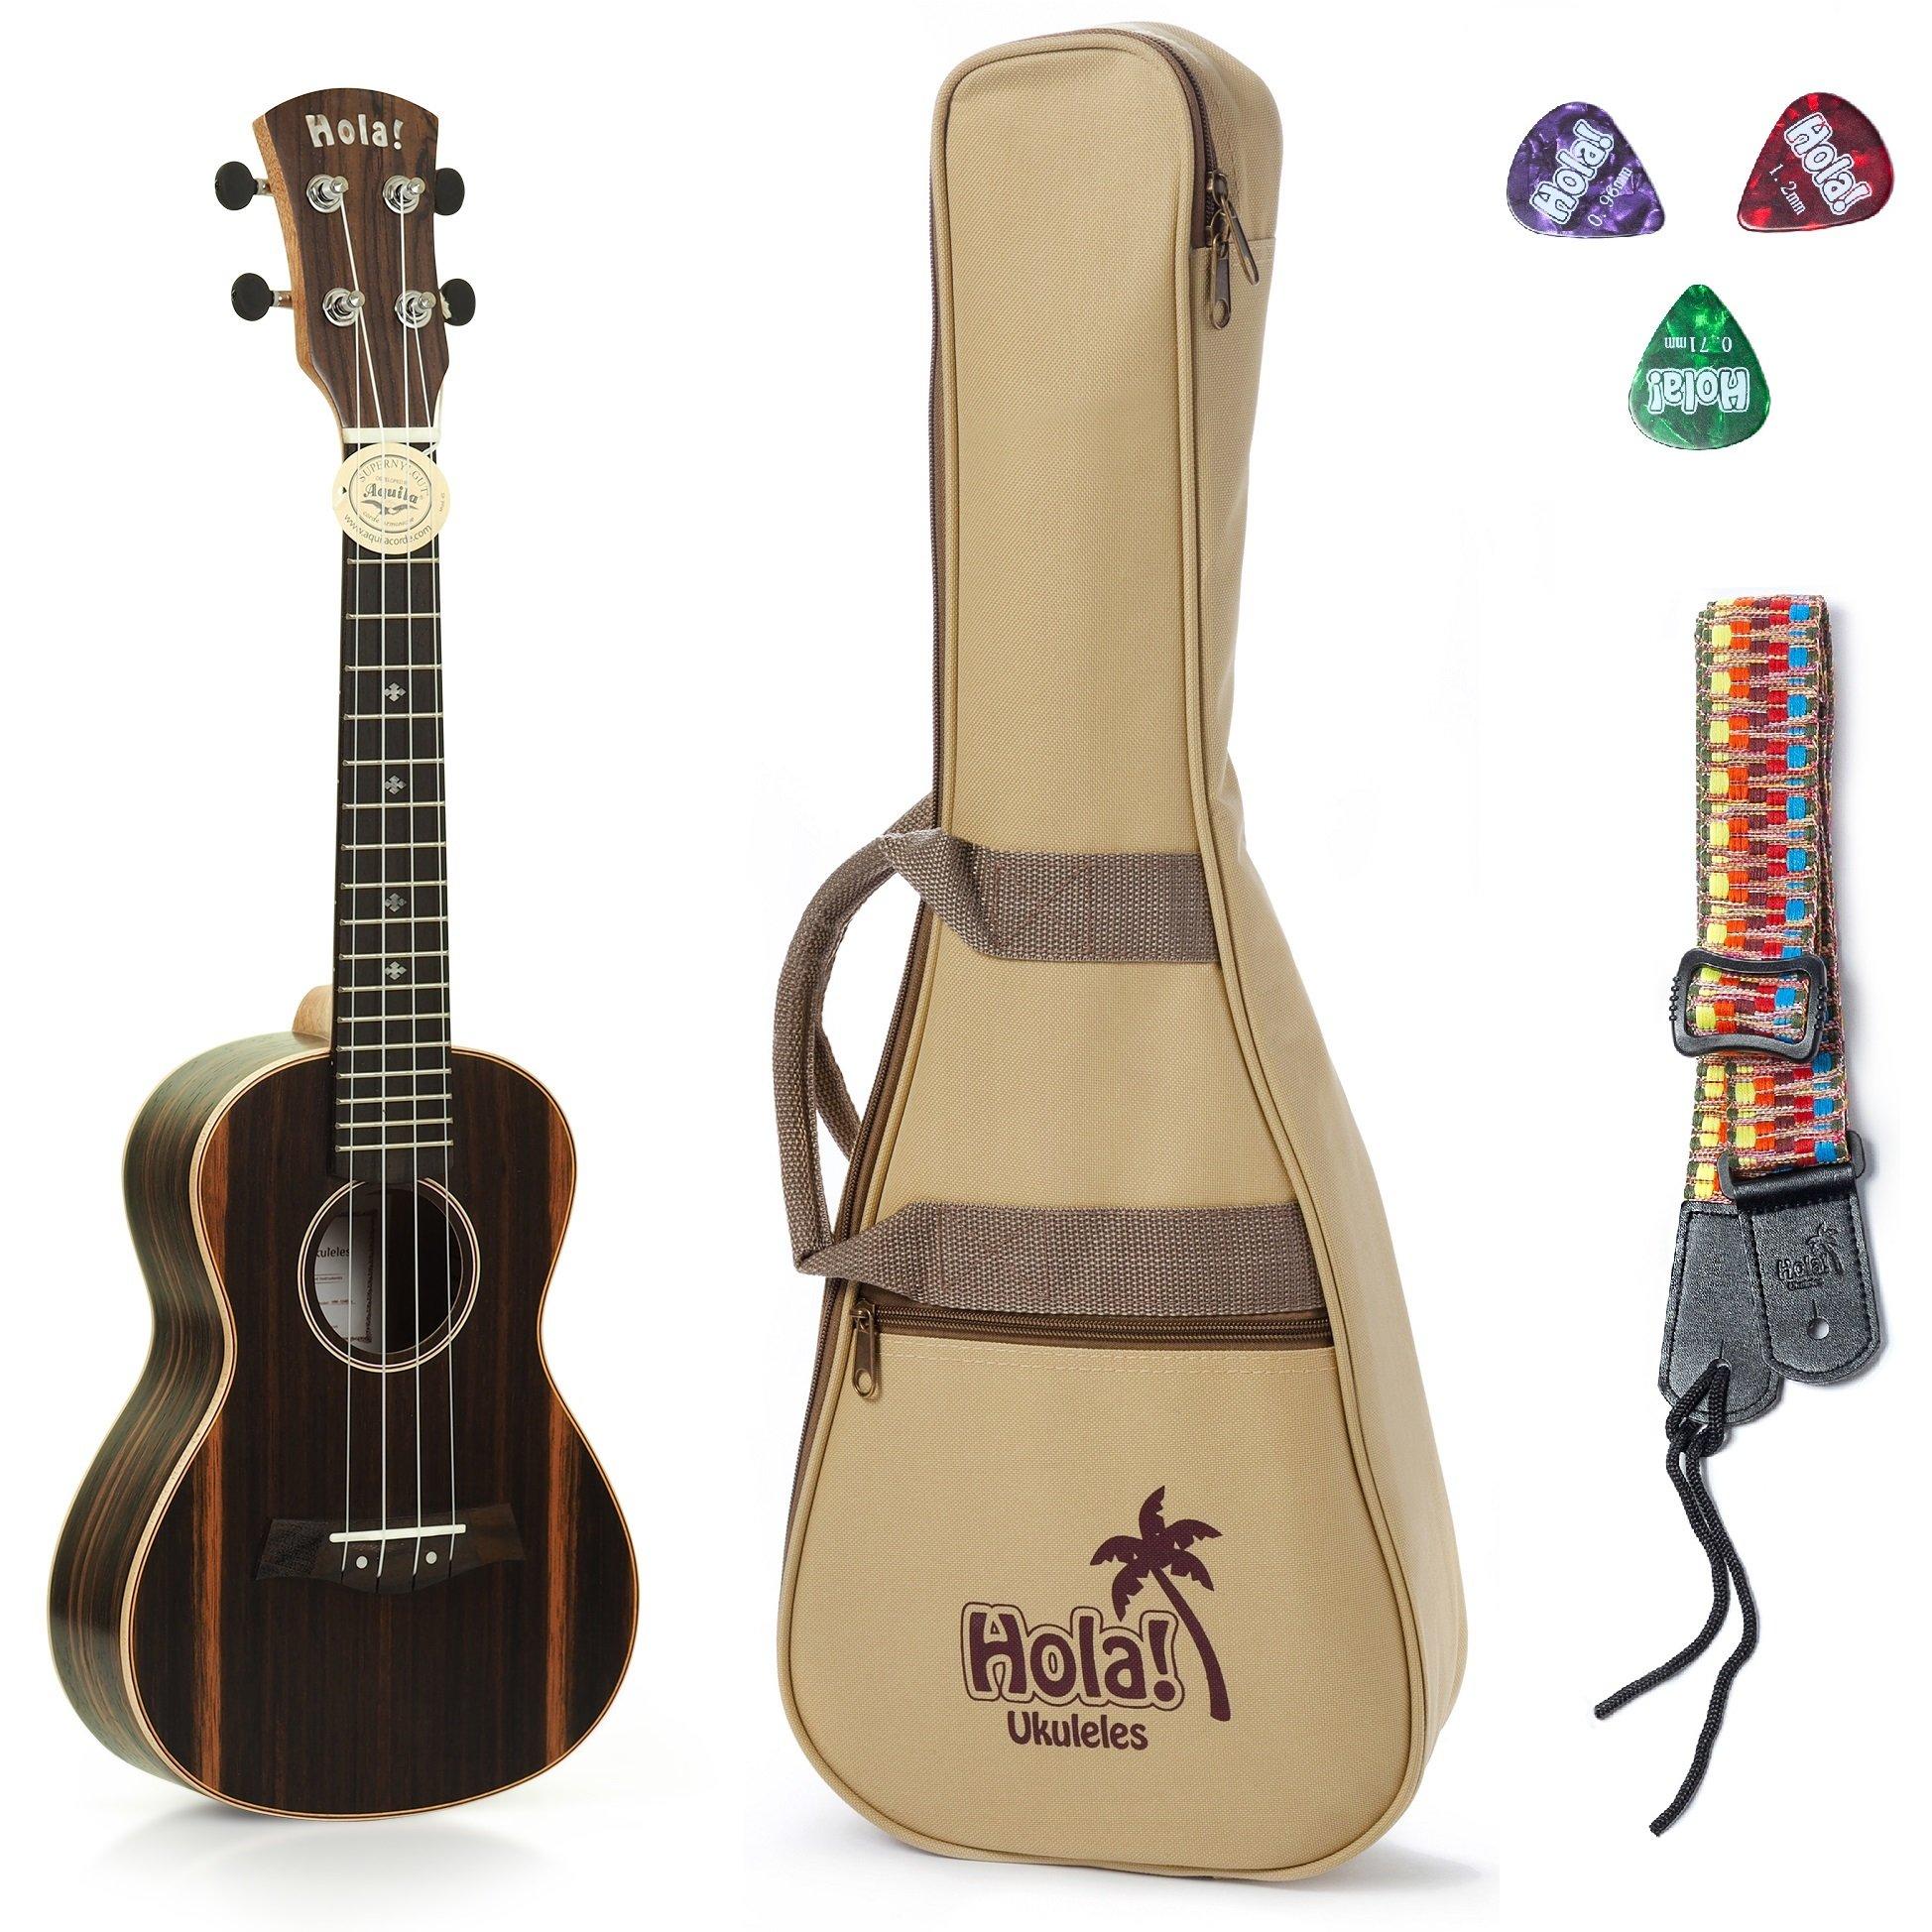 Concert Ukulele Deluxe Series by Hola! Music (Model HM-124EB+), Bundle Includes: 24 Inch Ebony Ukulele with Aquila Nylgut Strings Installed, Padded Gig Bag, Strap and Picks - Limited Edition